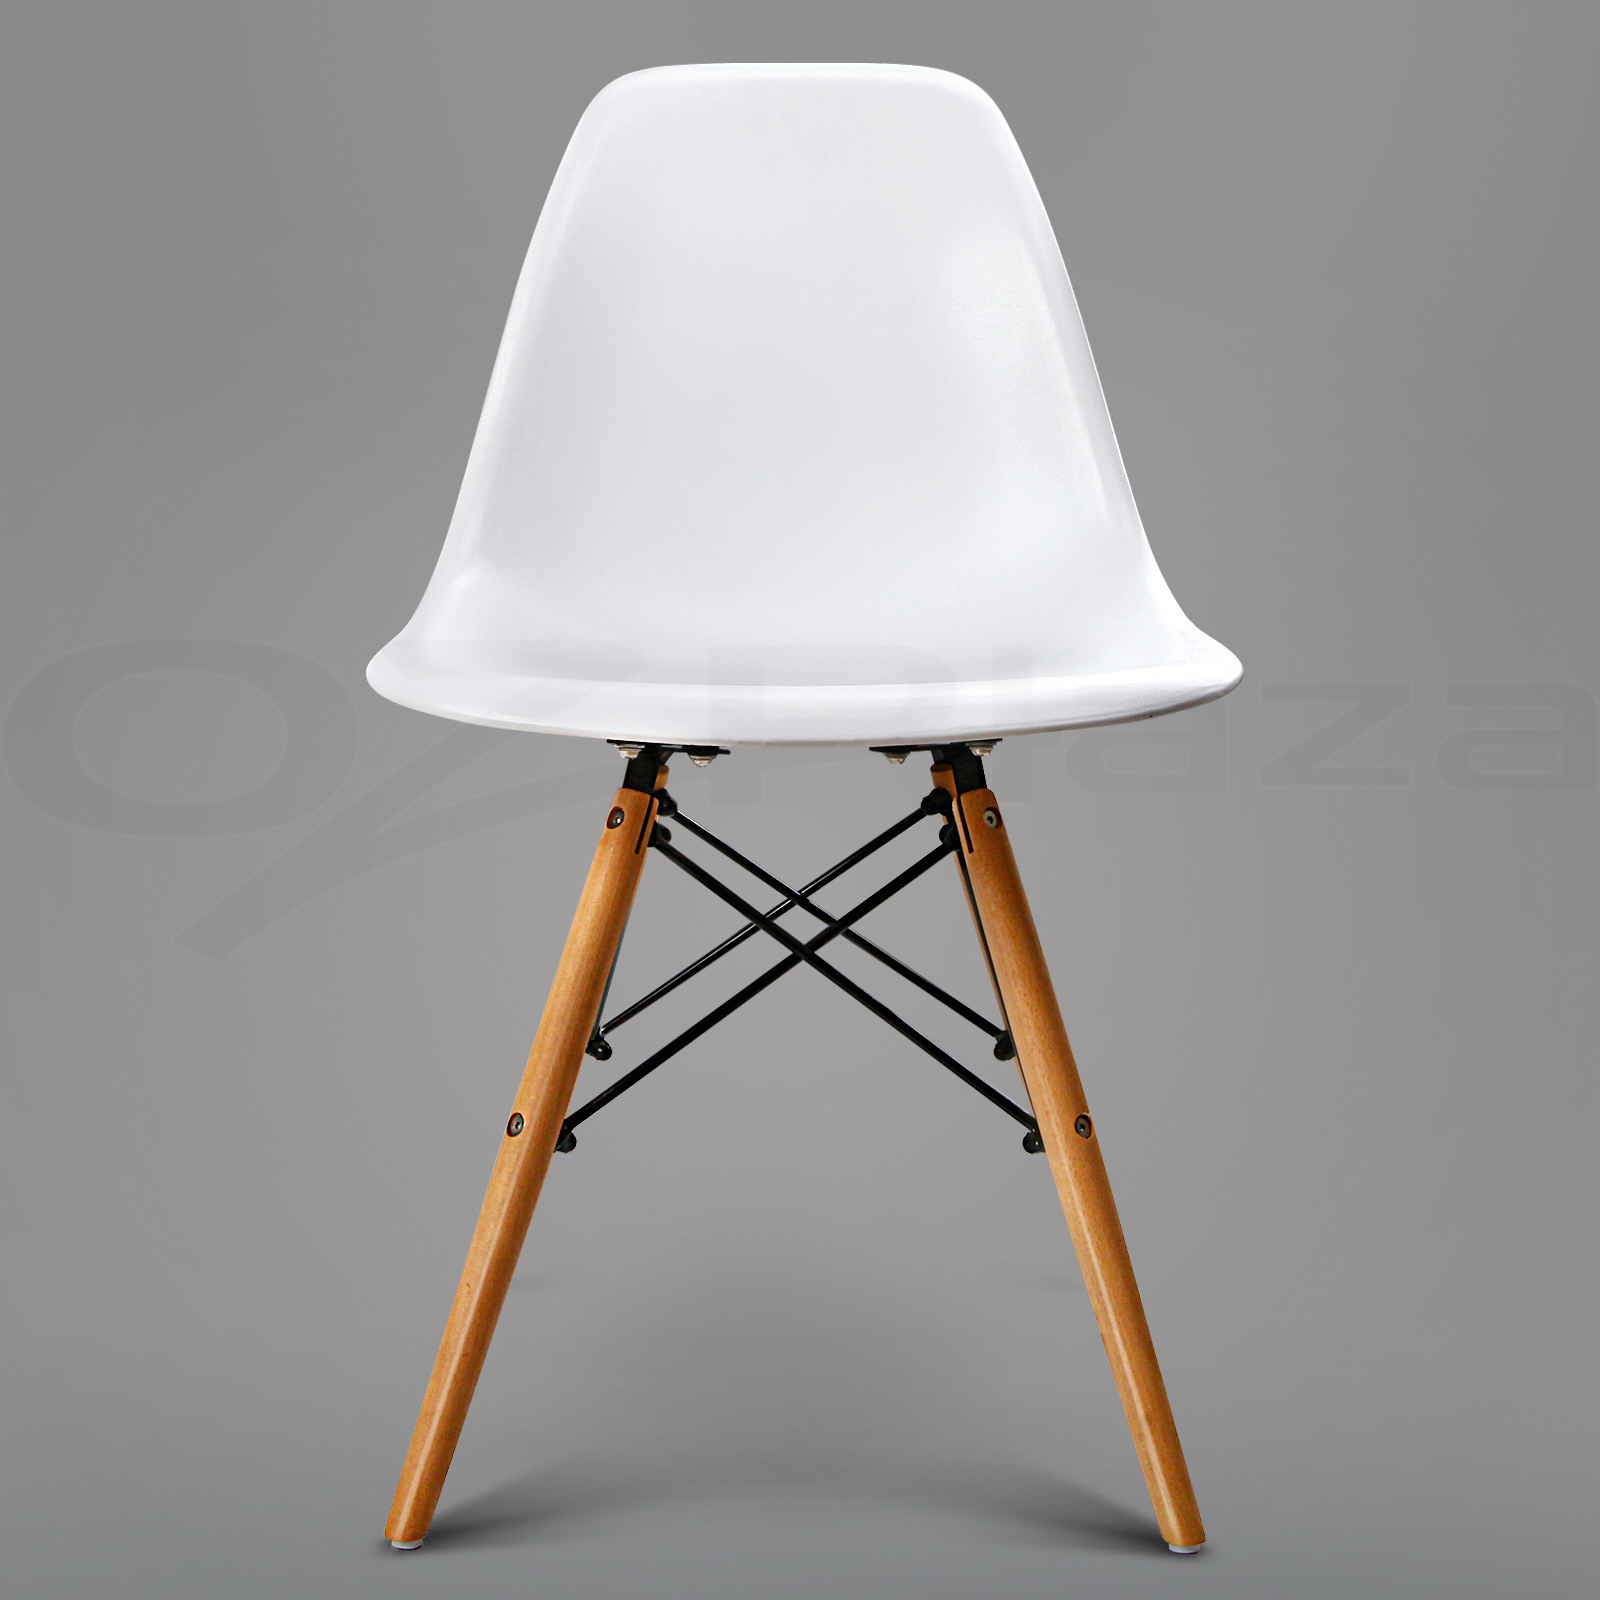 6 X Retro Replica Eames Eiffel DSW Dining Chair Armchair Beech Wood Fabric  9350062058817 EBay6 X Retro Replica Eames Eiffel DSW Dining Chair Armchair  Beech